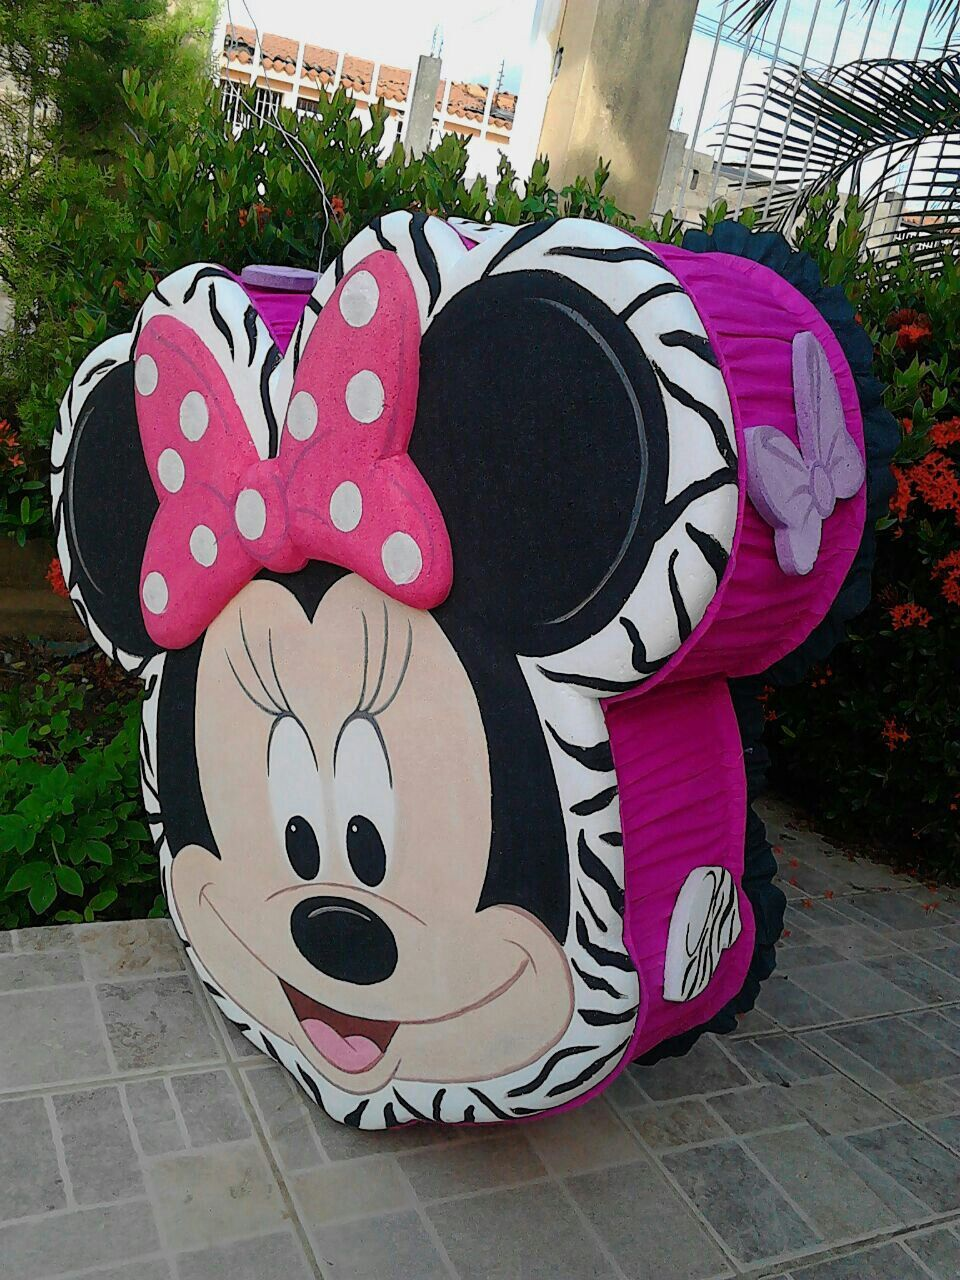 Piñatas~Minnie Mouse Piñata ❤ Minnie Mouse❤ | piñatas ...